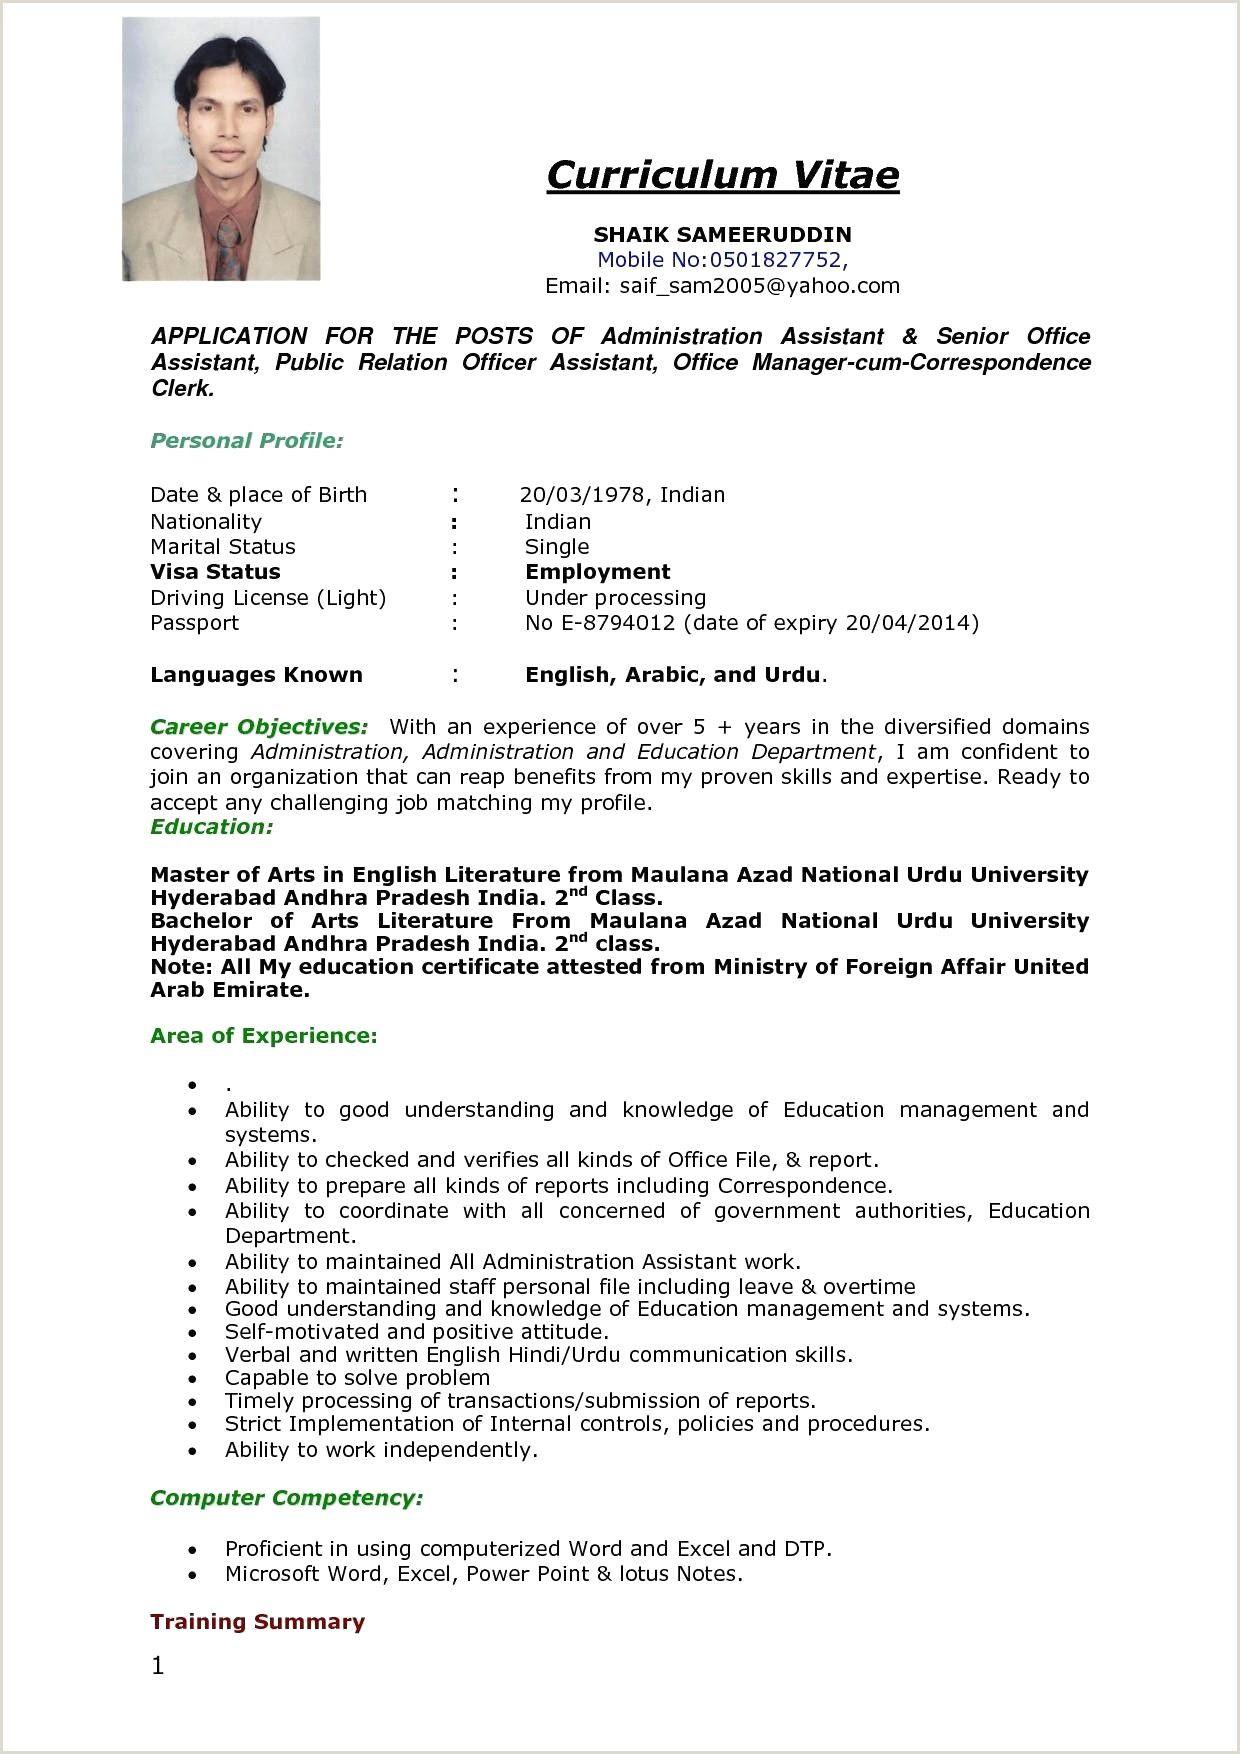 Modelos De Curriculum Vitae Para Rellenar Sencillo Modelos De Curriculum Vitae Curriculum Vitae Descargar Curriculum Vitae